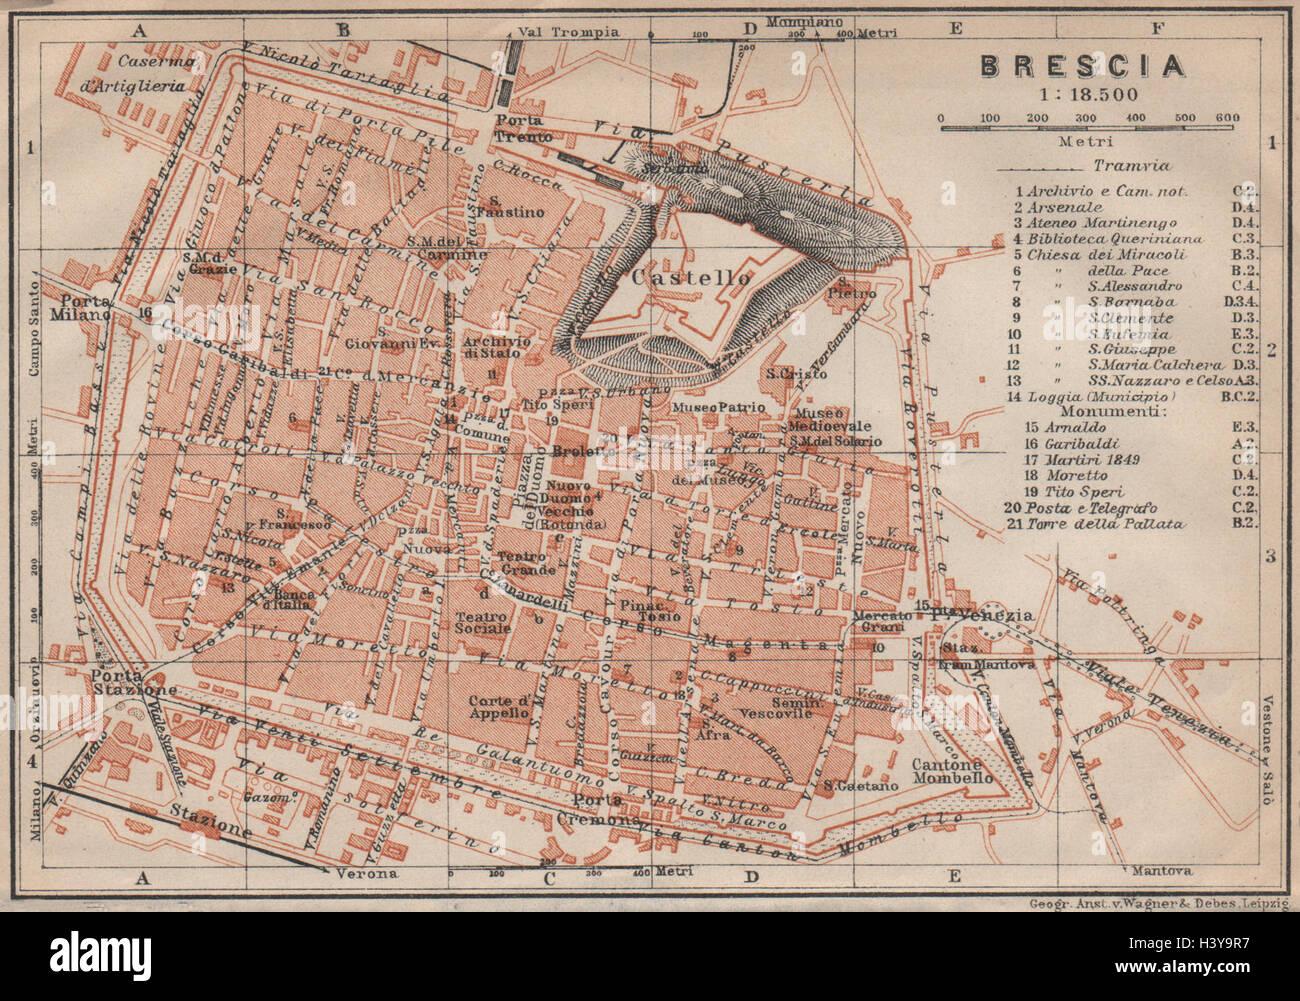 NAPOLI NAPLES antique town city plan piano urbanistico Italy mappa 1911